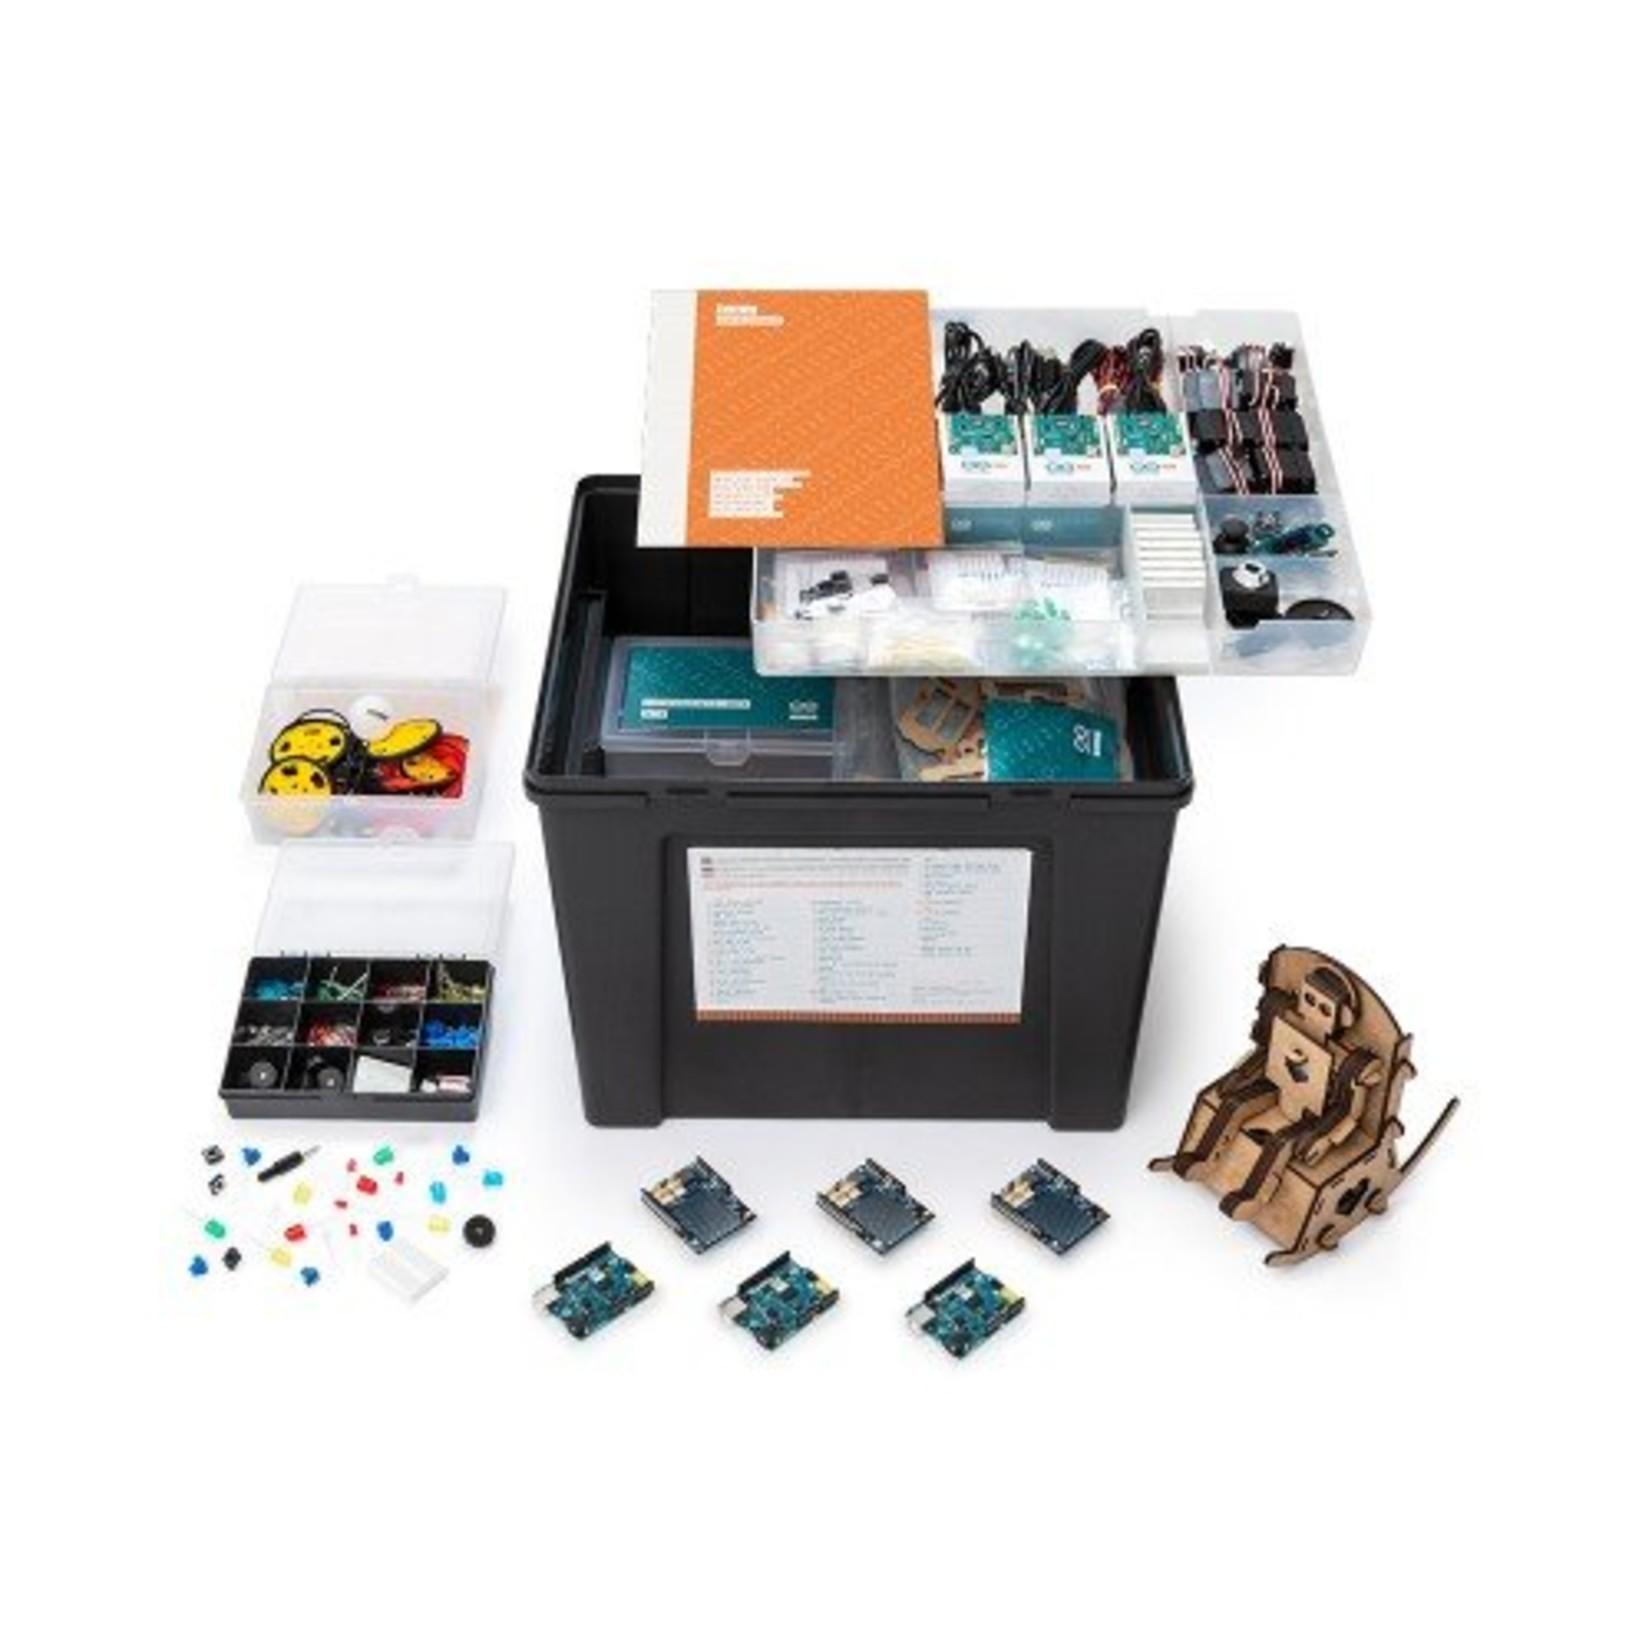 ARDUINO ARDUINO CTC 101 - modular STEAM projects - FulL